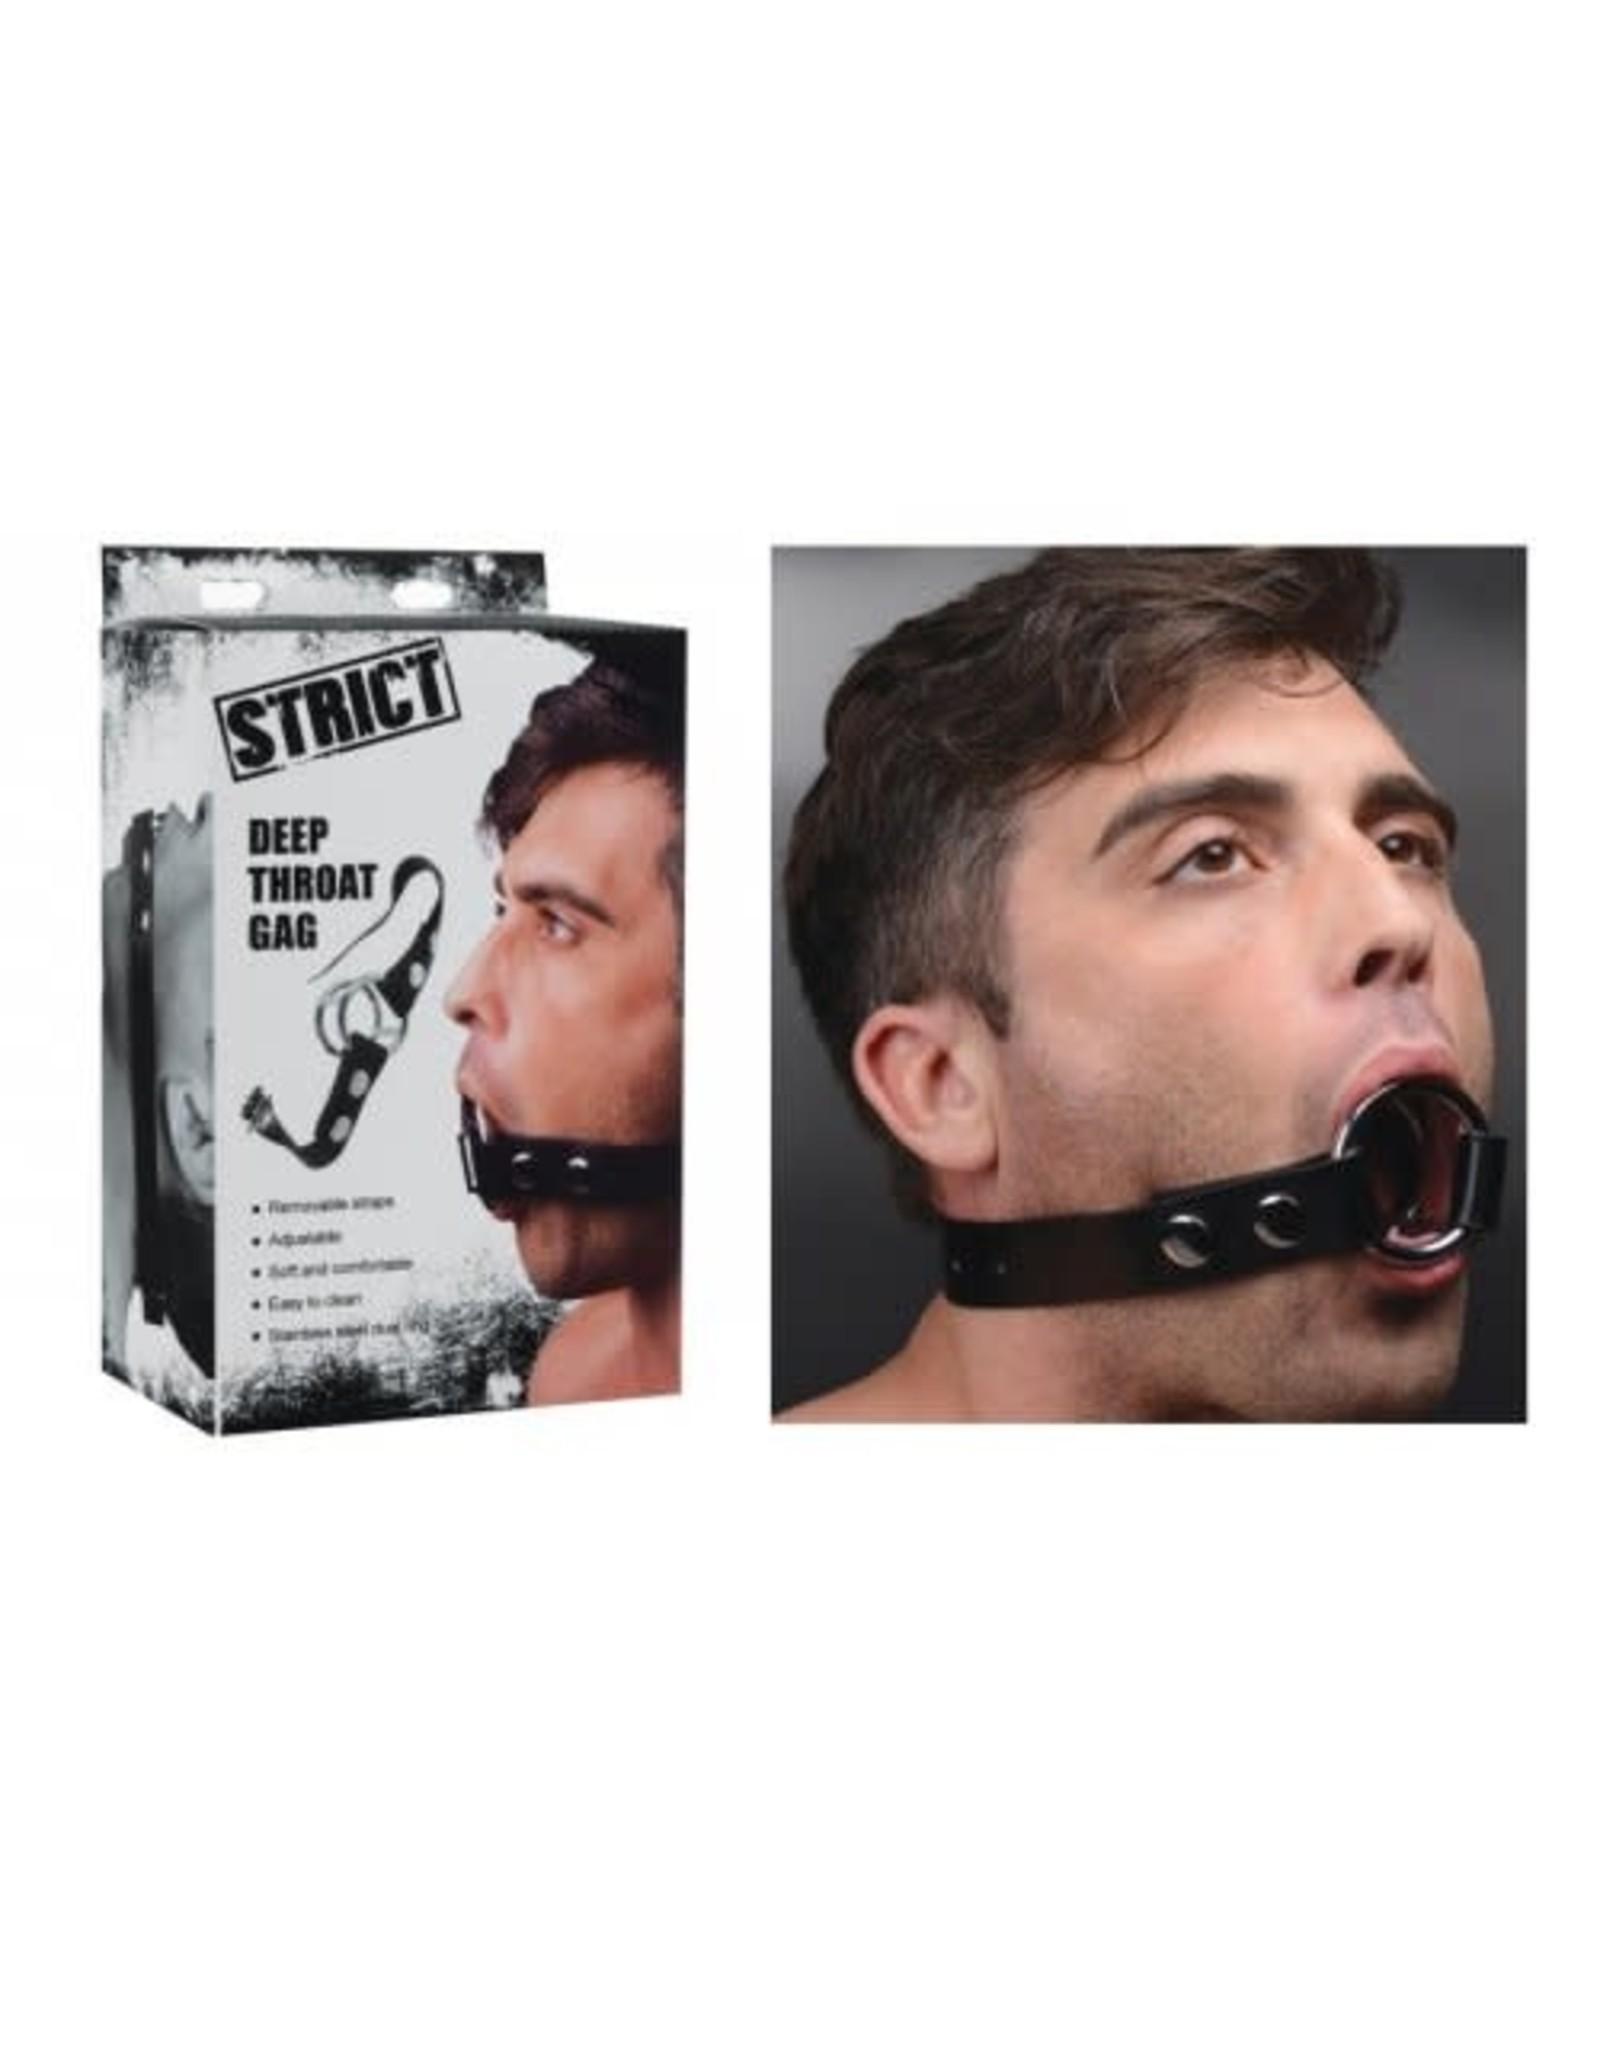 STRICT STRICT Deep Throat Gag